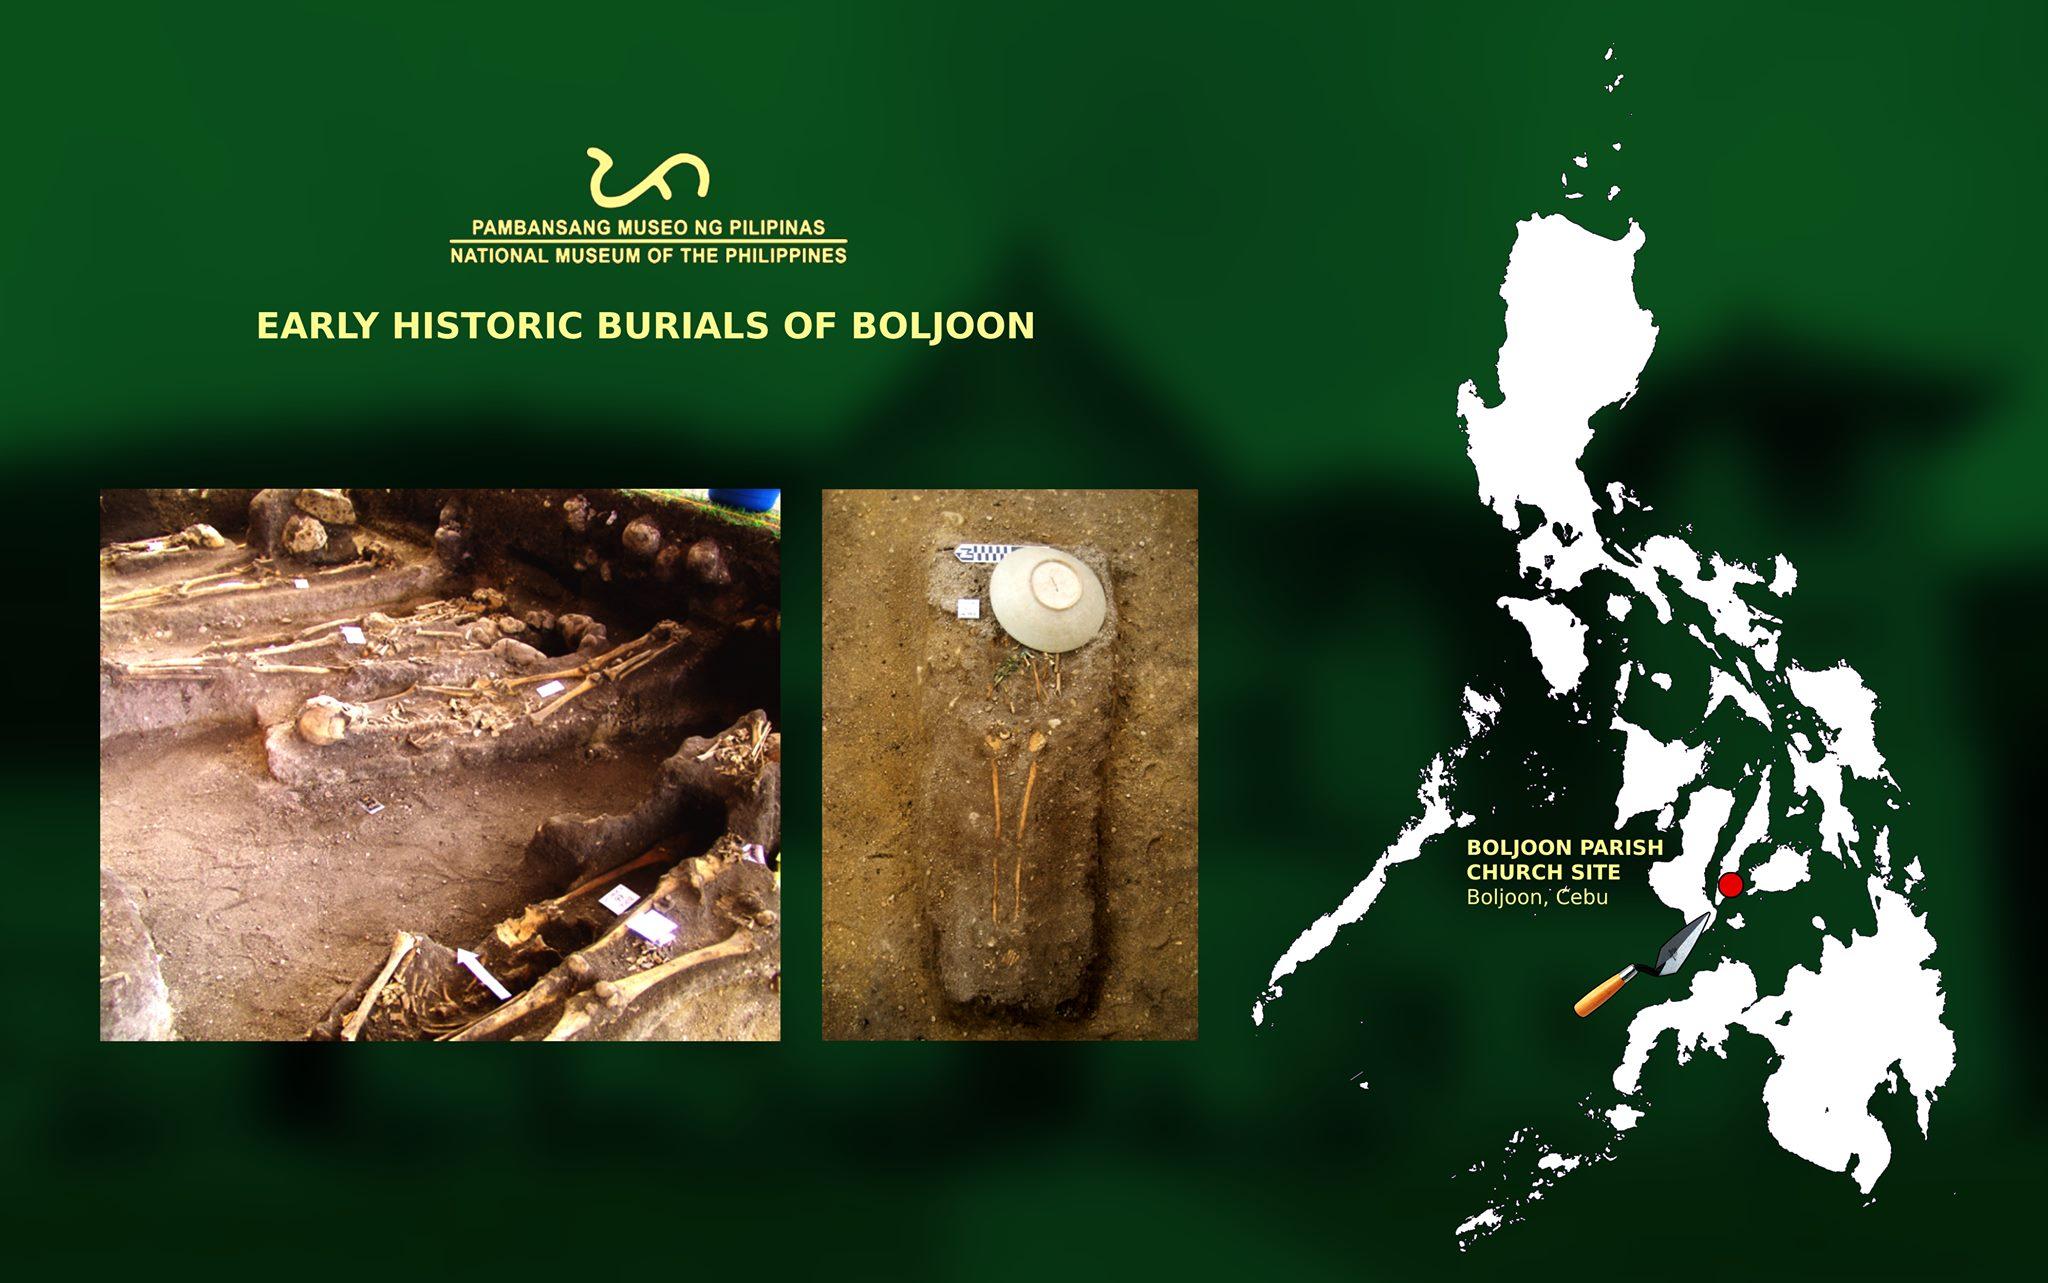 Early Historical Burials Excavated in Boljoon, Cebu [Philippine History]